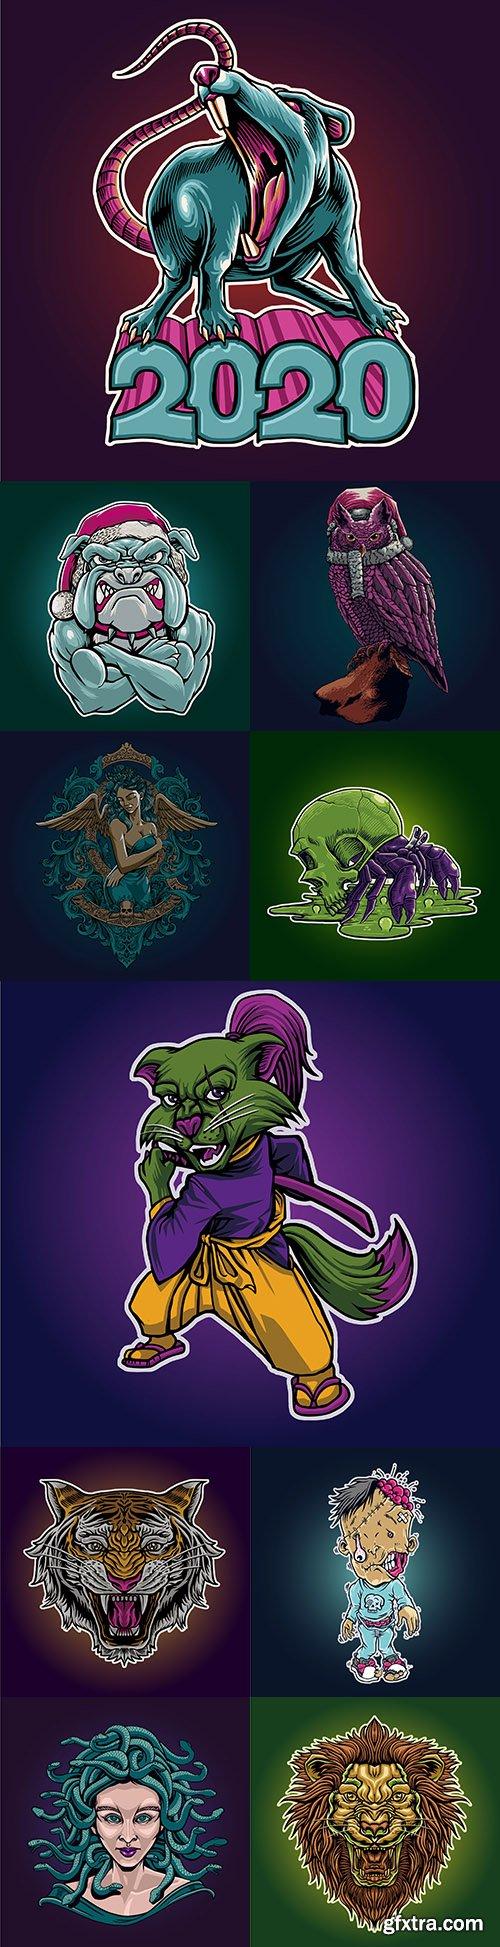 Tattoo and emblem cartoon drawing design illustration 2